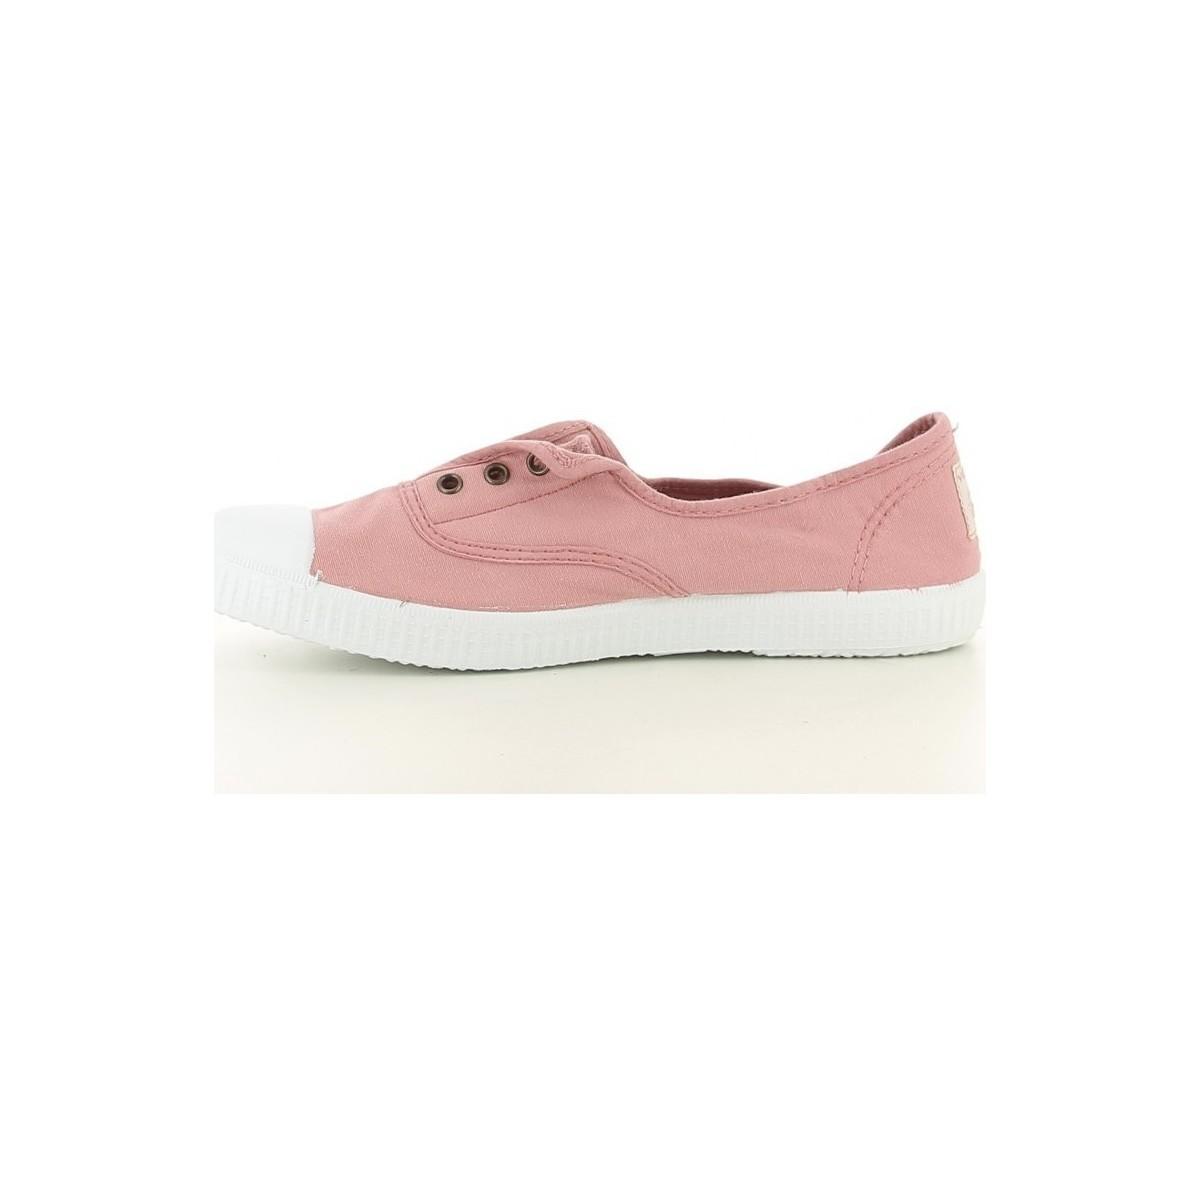 106623 rosa Chaussures Victoria en coloris Rose